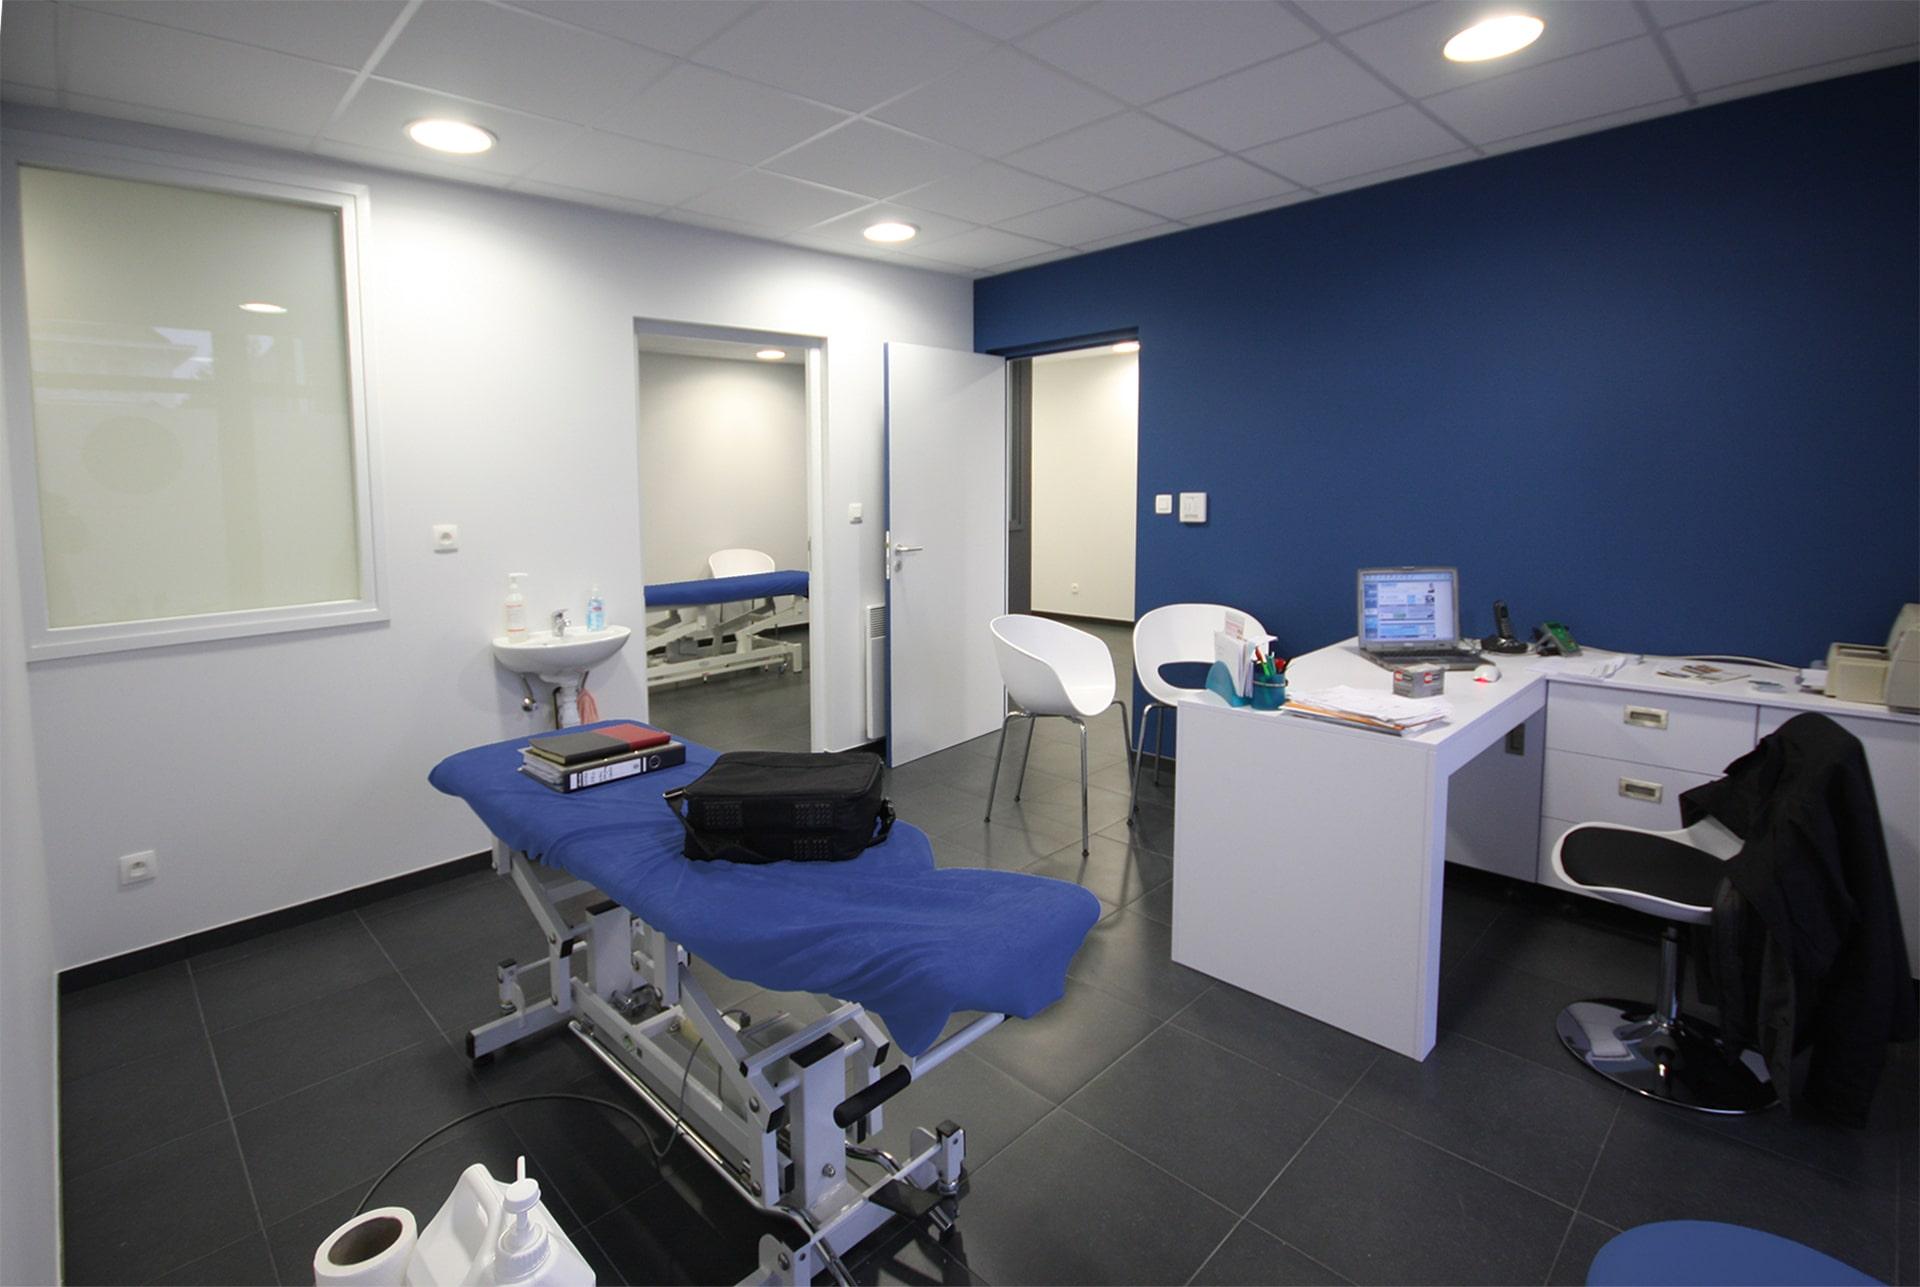 Architecte Lille Renovation Cabinet Medical Centre Medical Nord VR-architecture